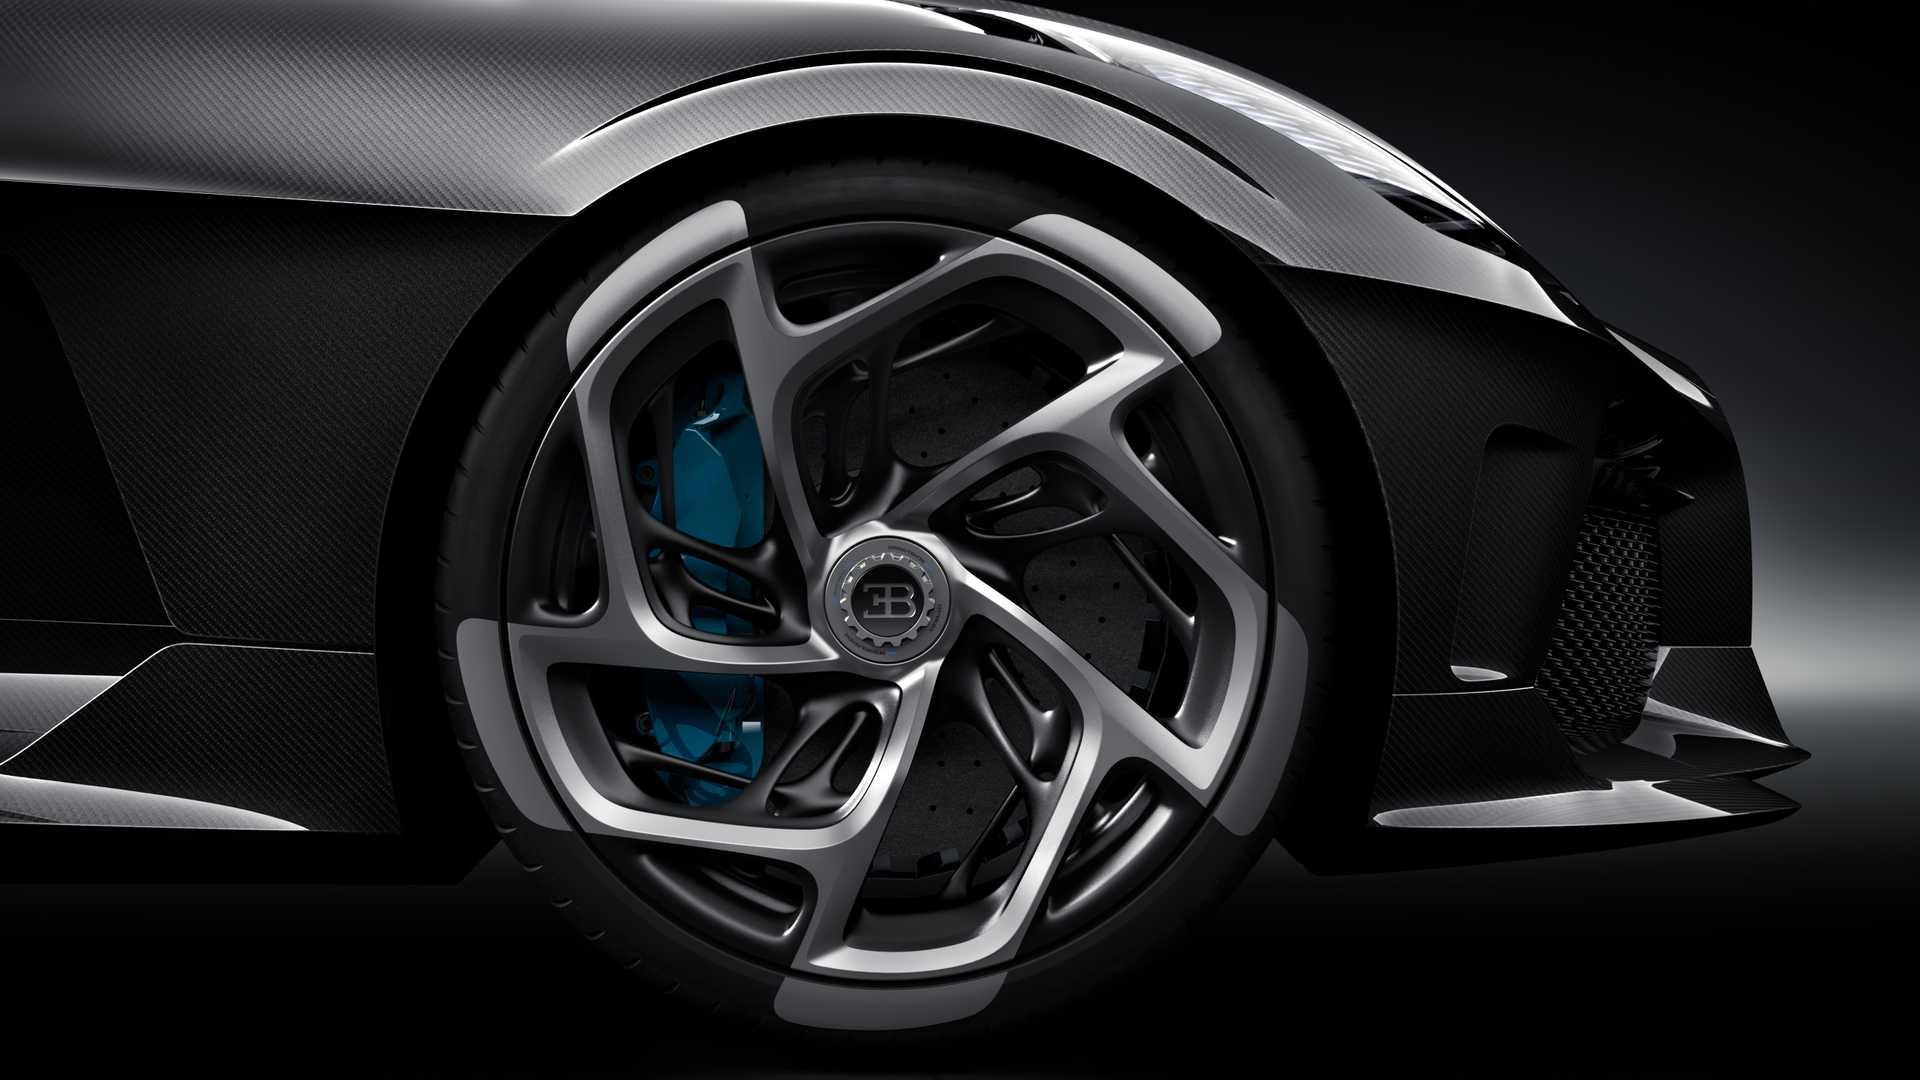 2019 Bugatti La Voiture Noire Wheel Wallpapers (14)